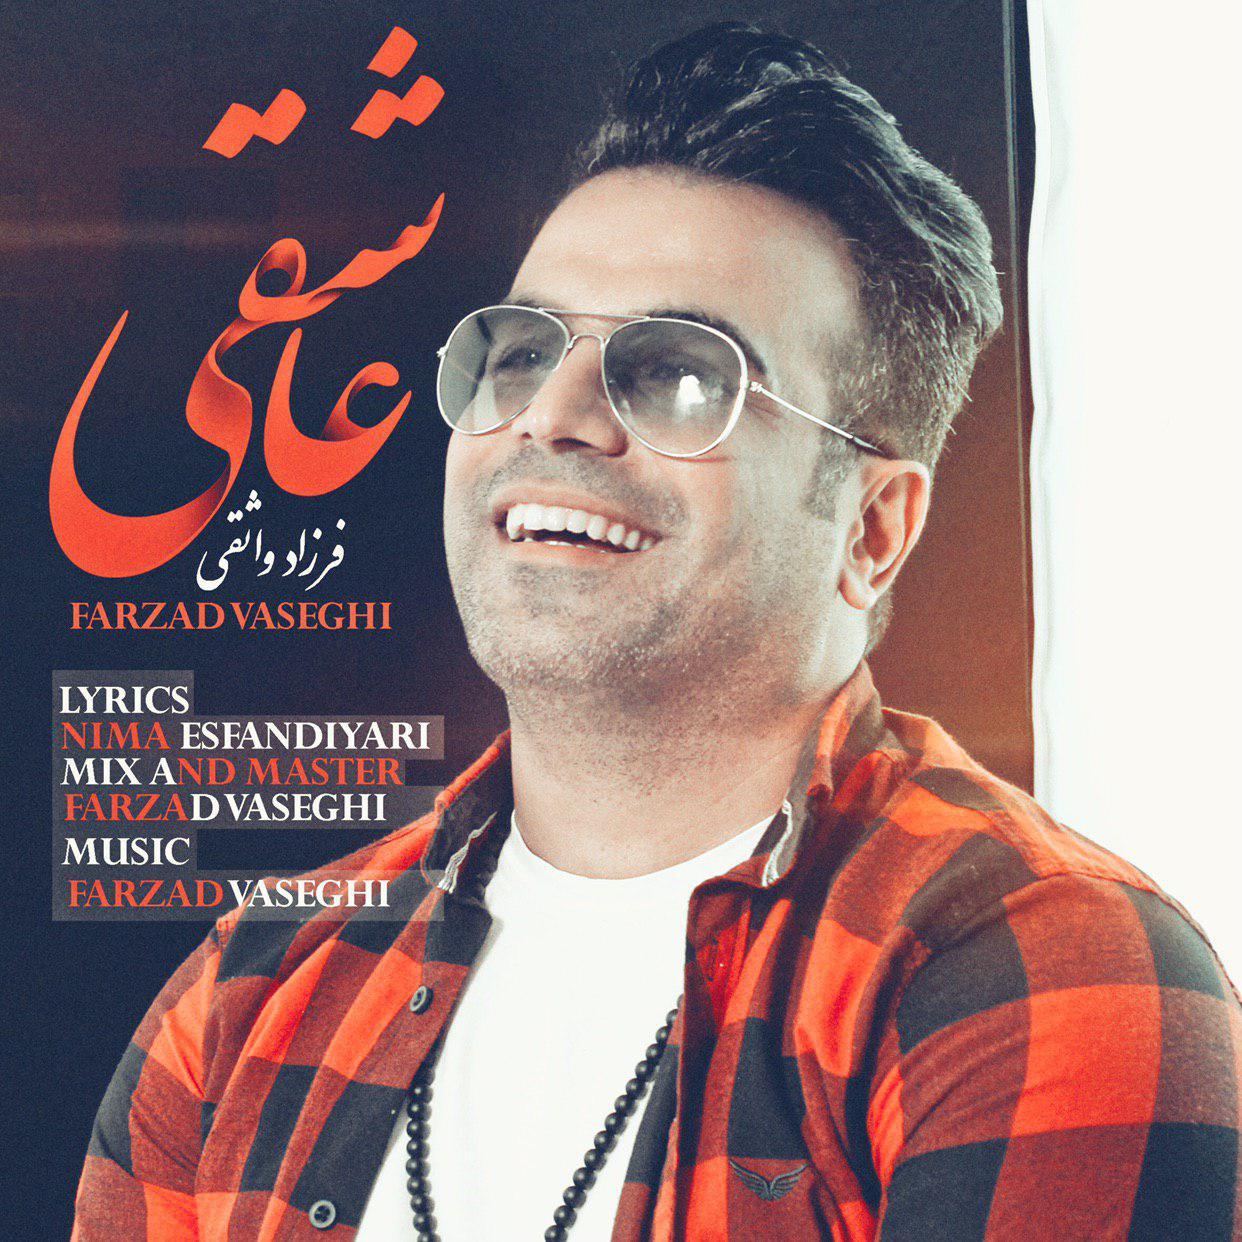 Farzad Vaseghi - Asheghi Music | آهنگ  فرزاد واثقی - عاشقی